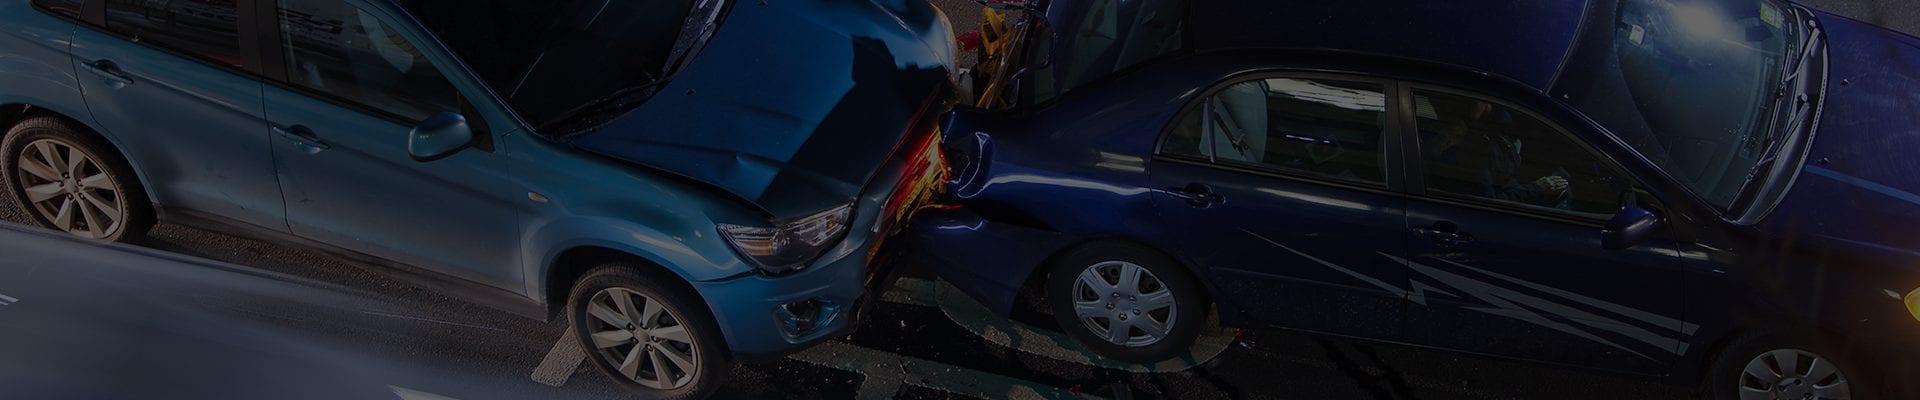 car accident in Phoenix Arizona